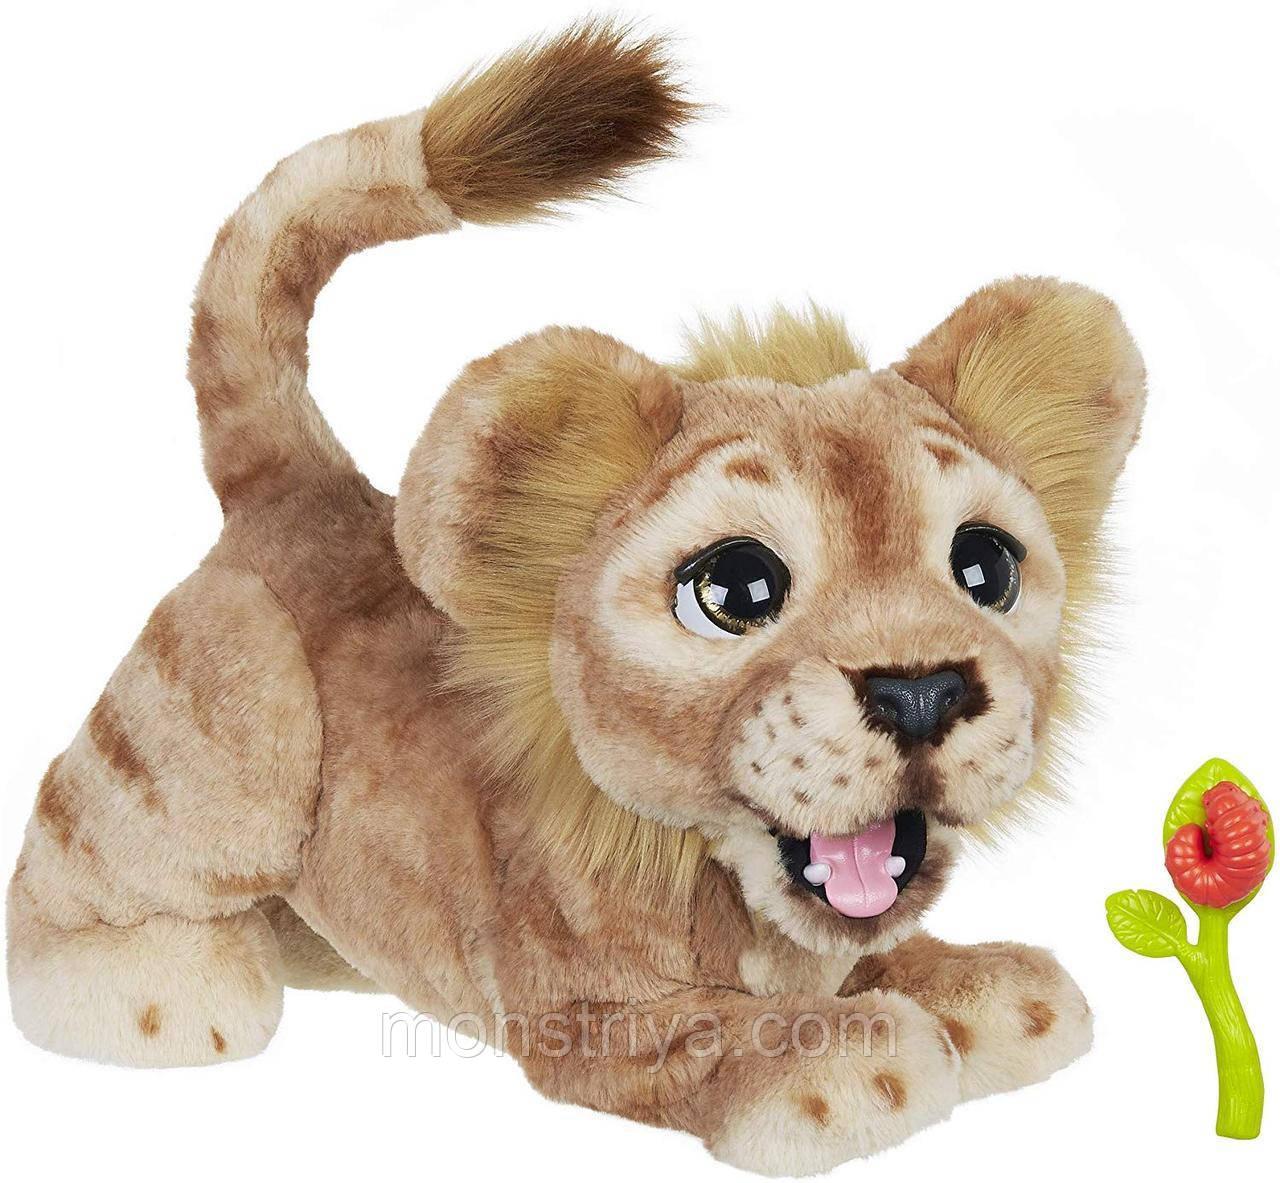 Интерактивная игрушка Могучий Лев Симба FurReal Friends от Hasbrо Disney The Lion King англ.яз